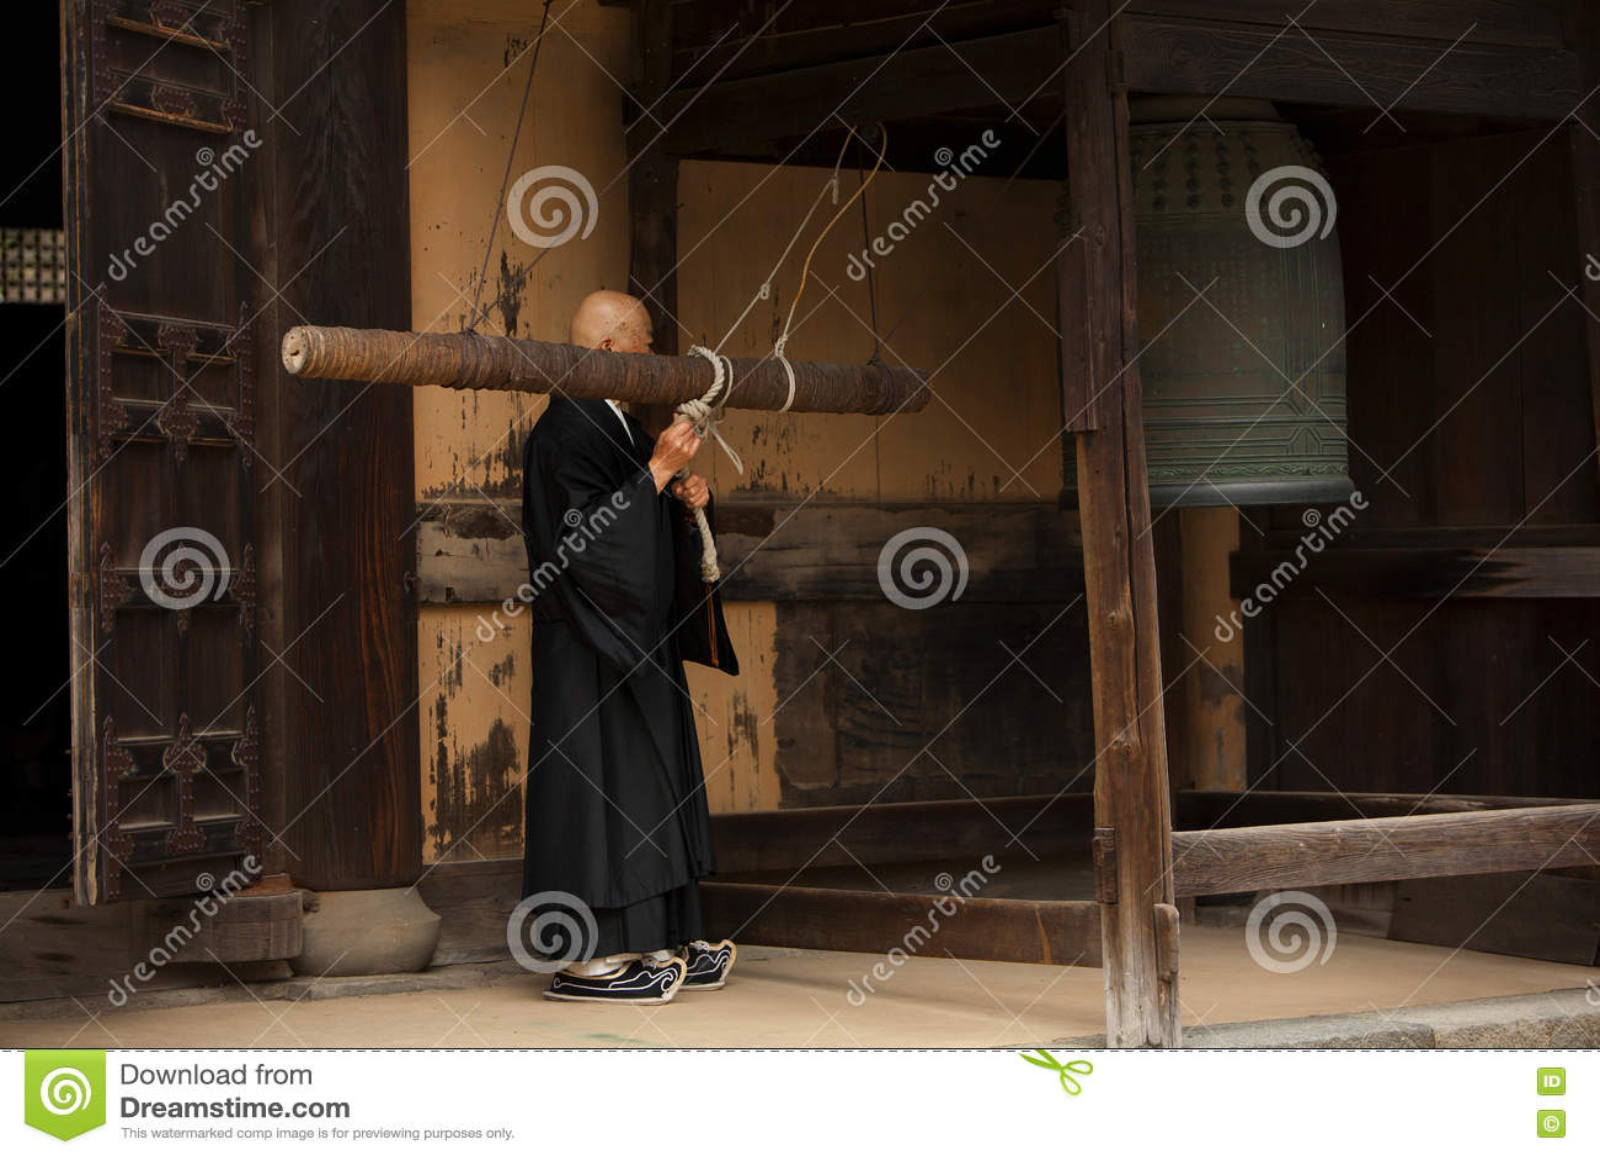 El monje budista suena una campana